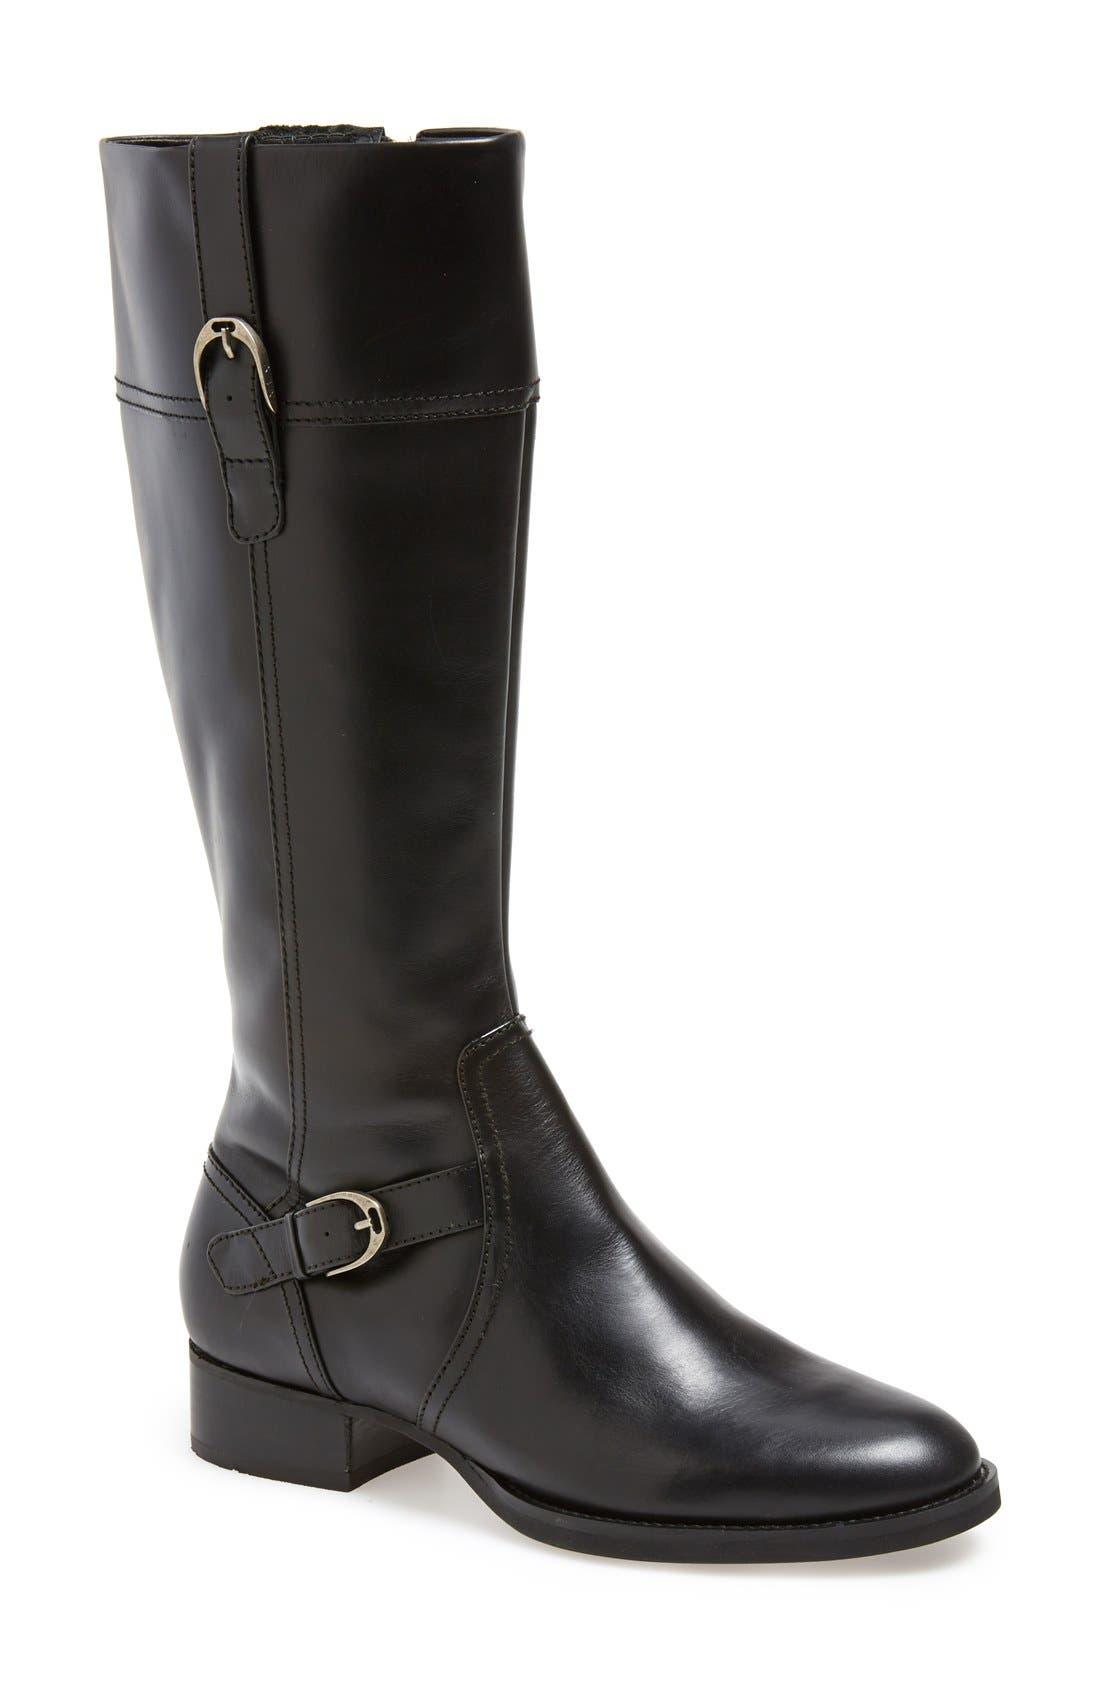 Alternate Image 1 Selected - Ariat 'York' Boot